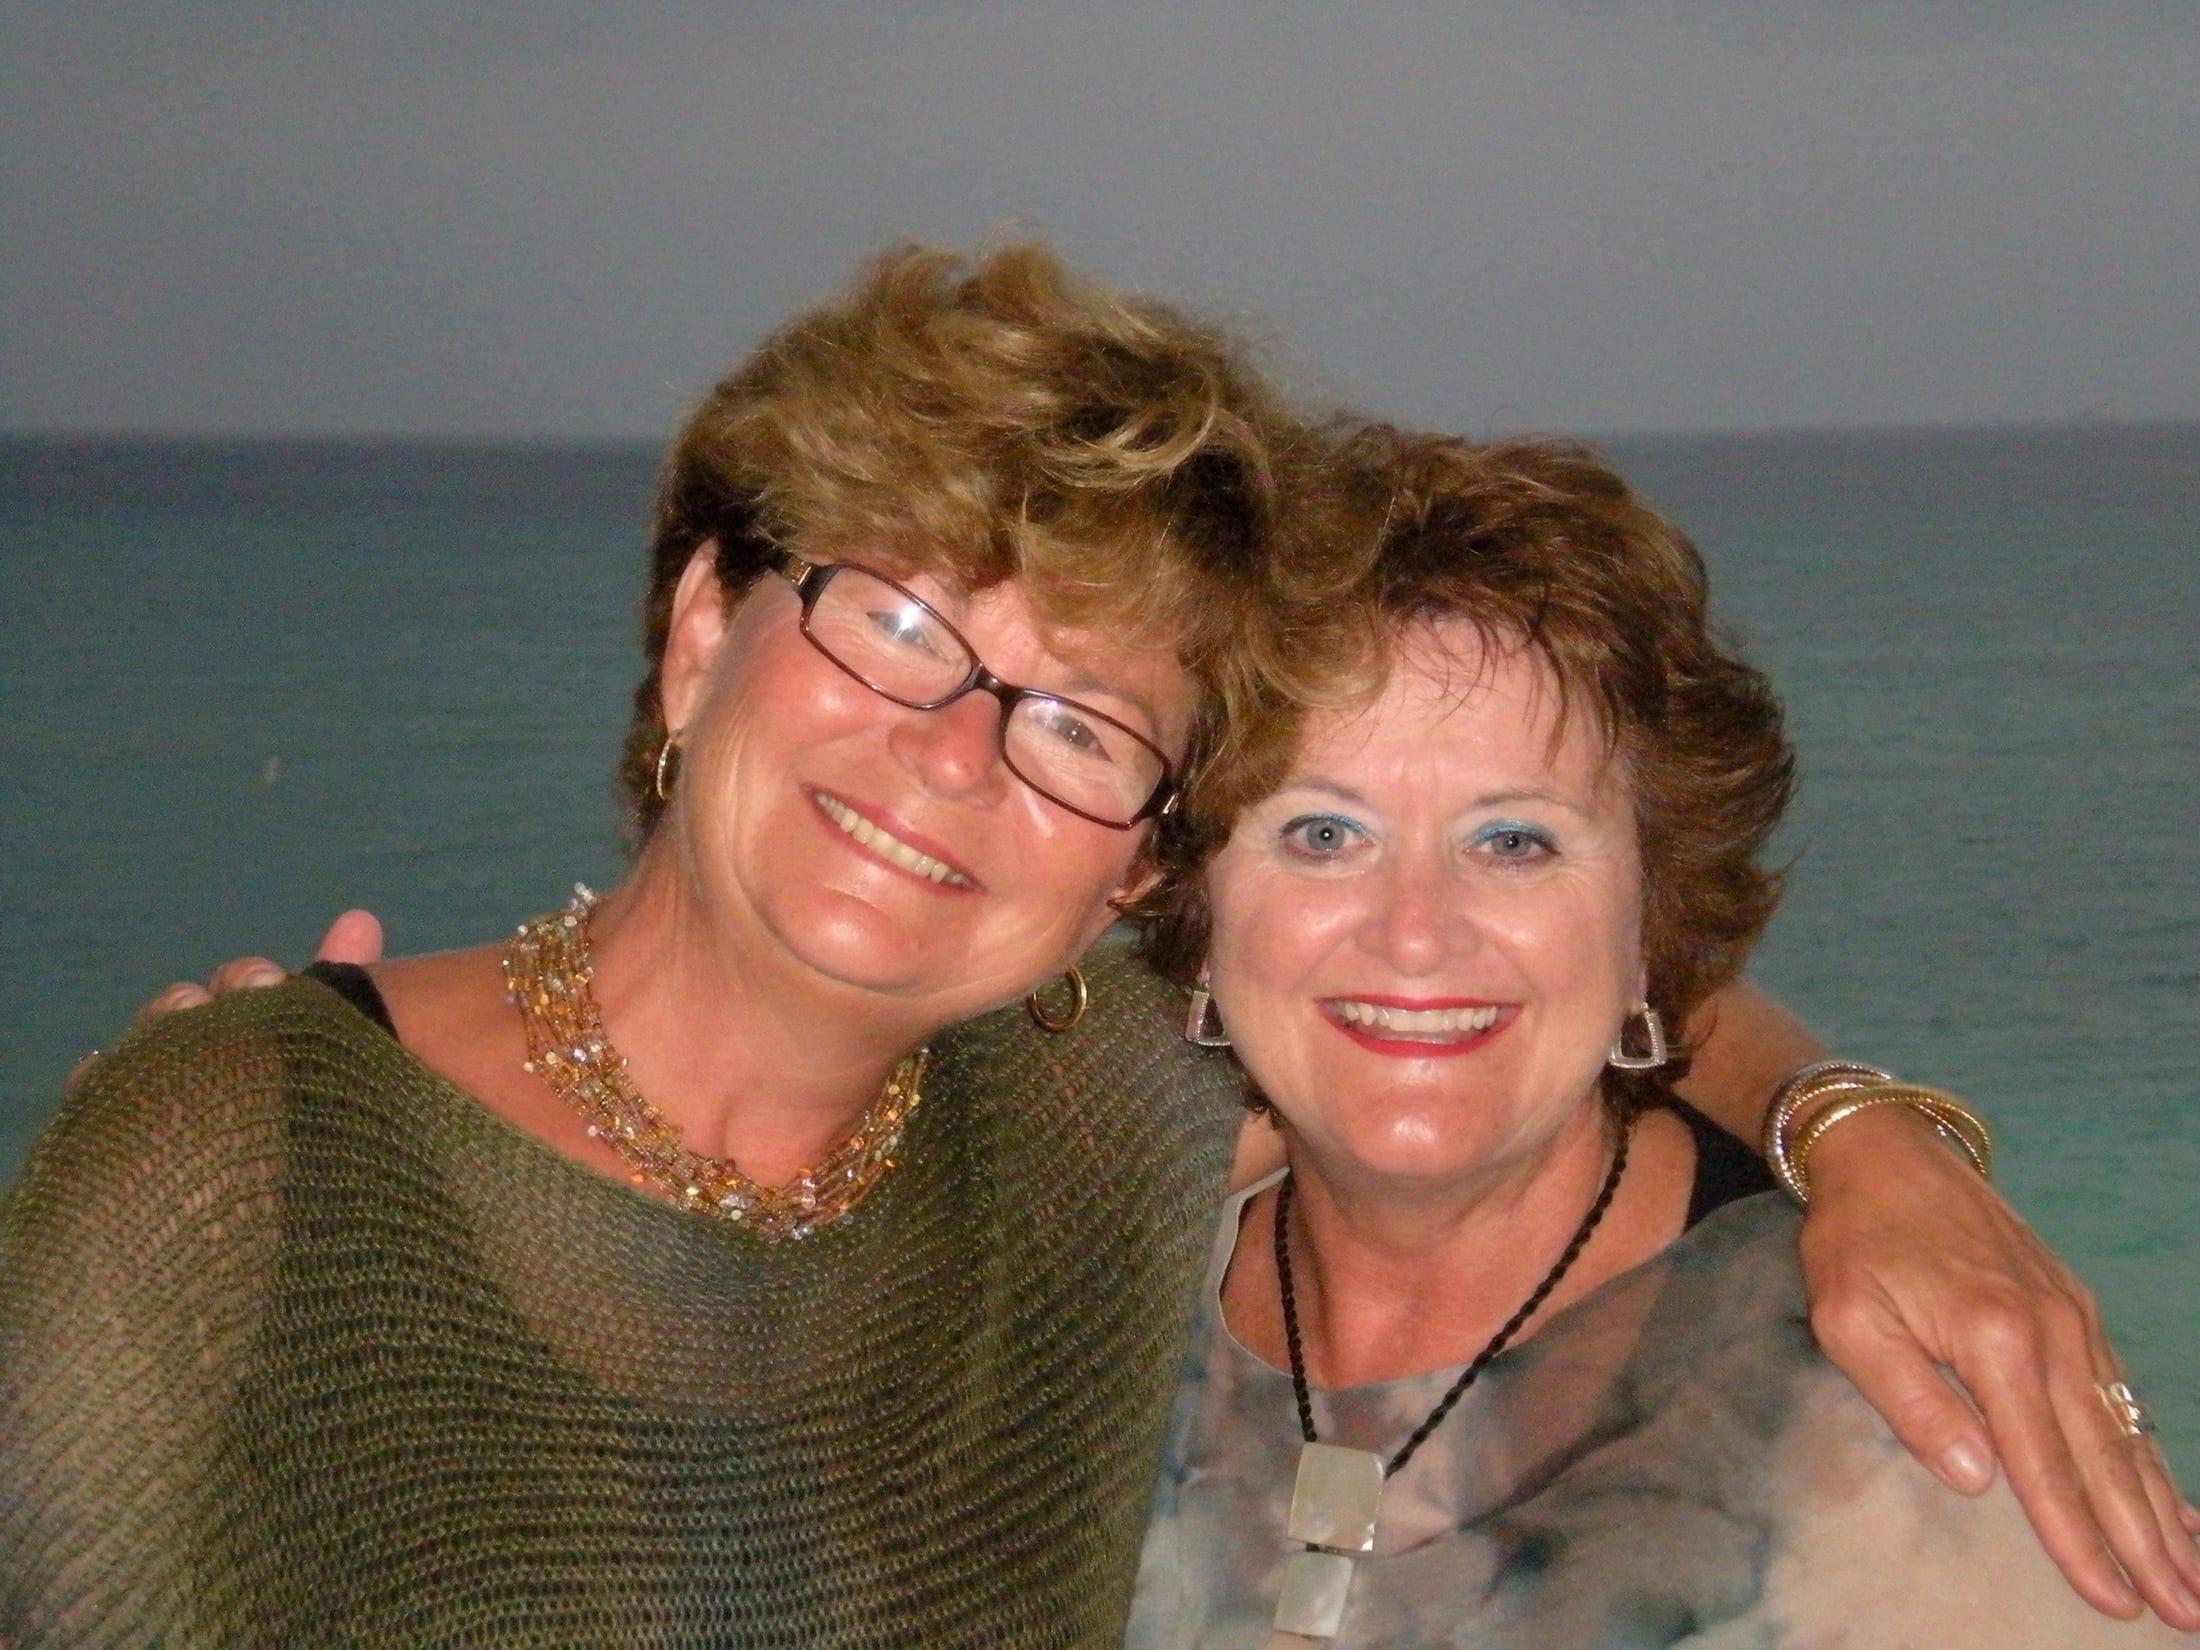 Cathy and her lifelong friend Cheryl